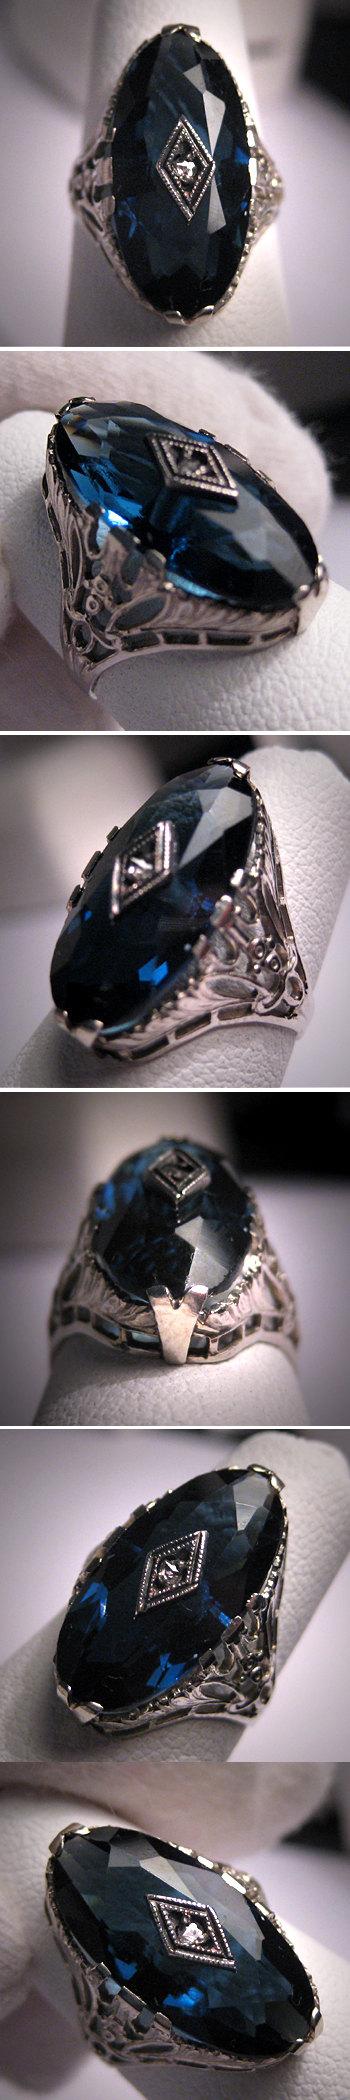 Antique Sapphire Diamond Wedding Ring Art by AawsombleiJewelry, $985.00